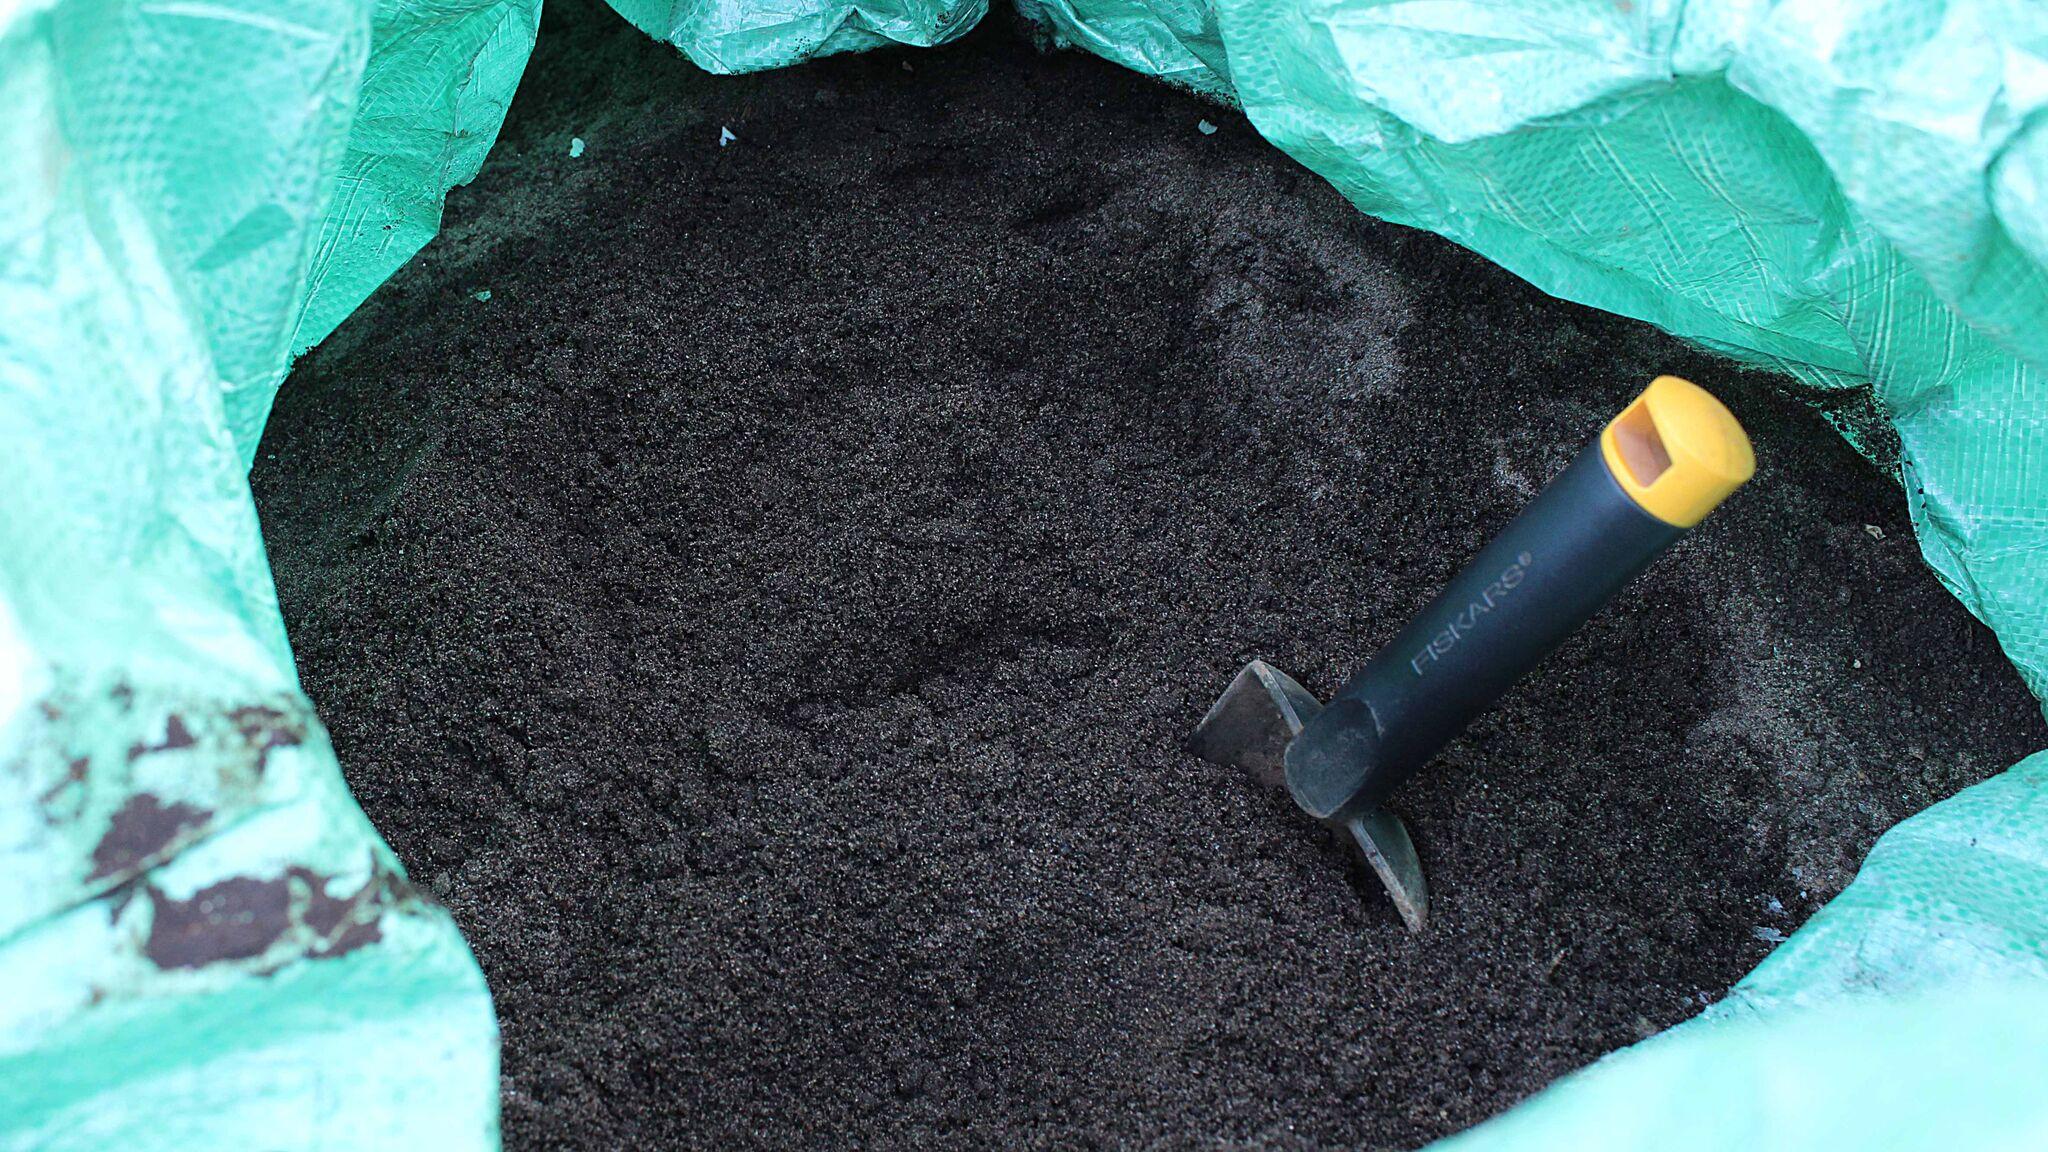 Soil3 organic humus compost ready for application